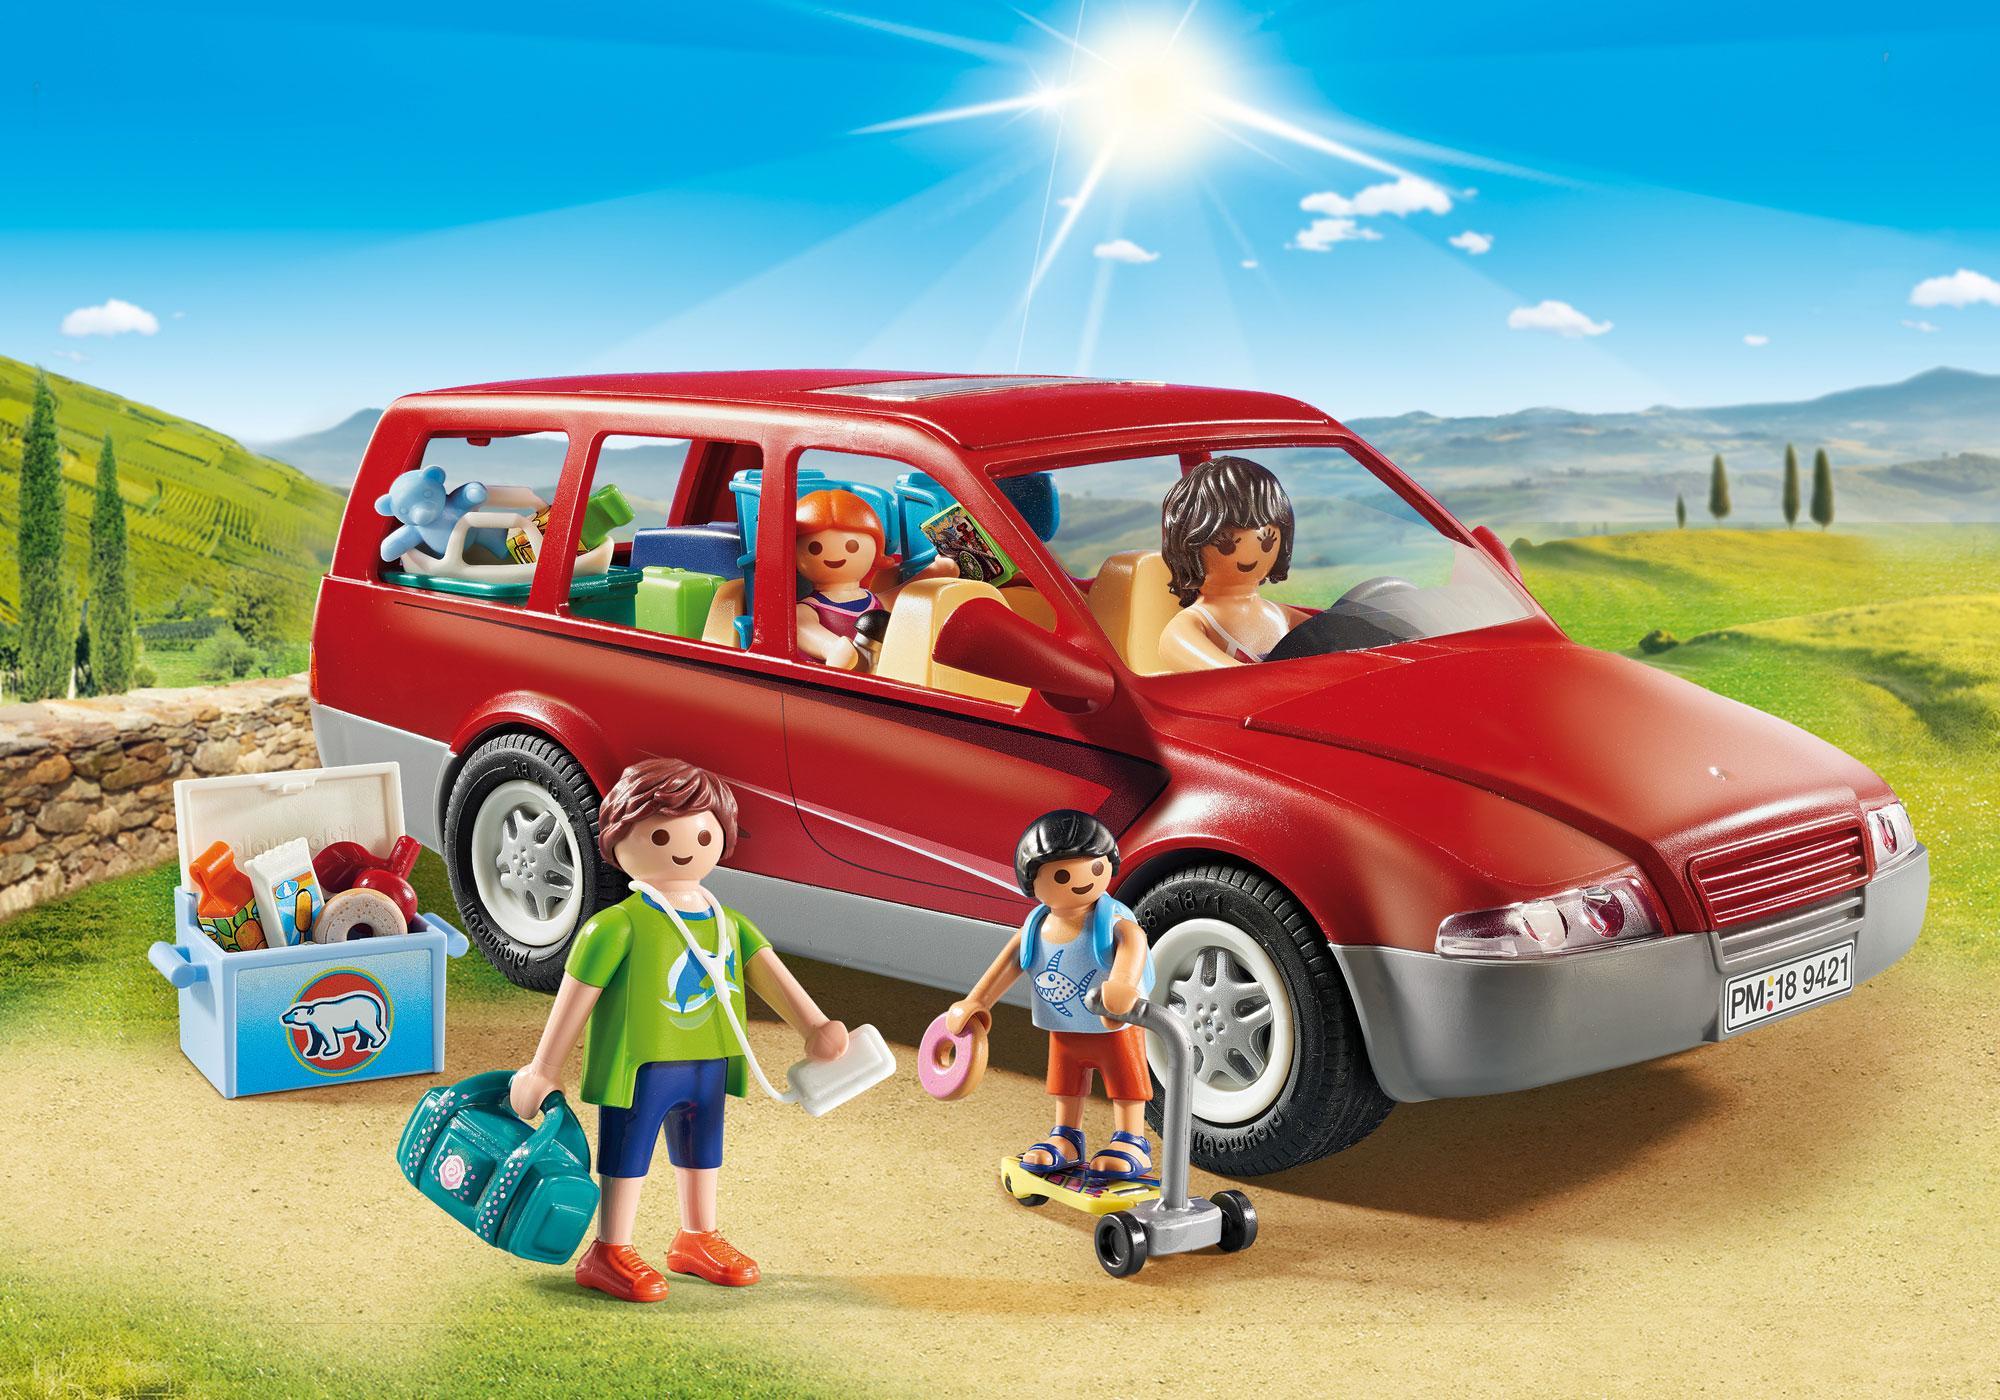 http://media.playmobil.com/i/playmobil/9421_product_detail/Samochód rodzinny